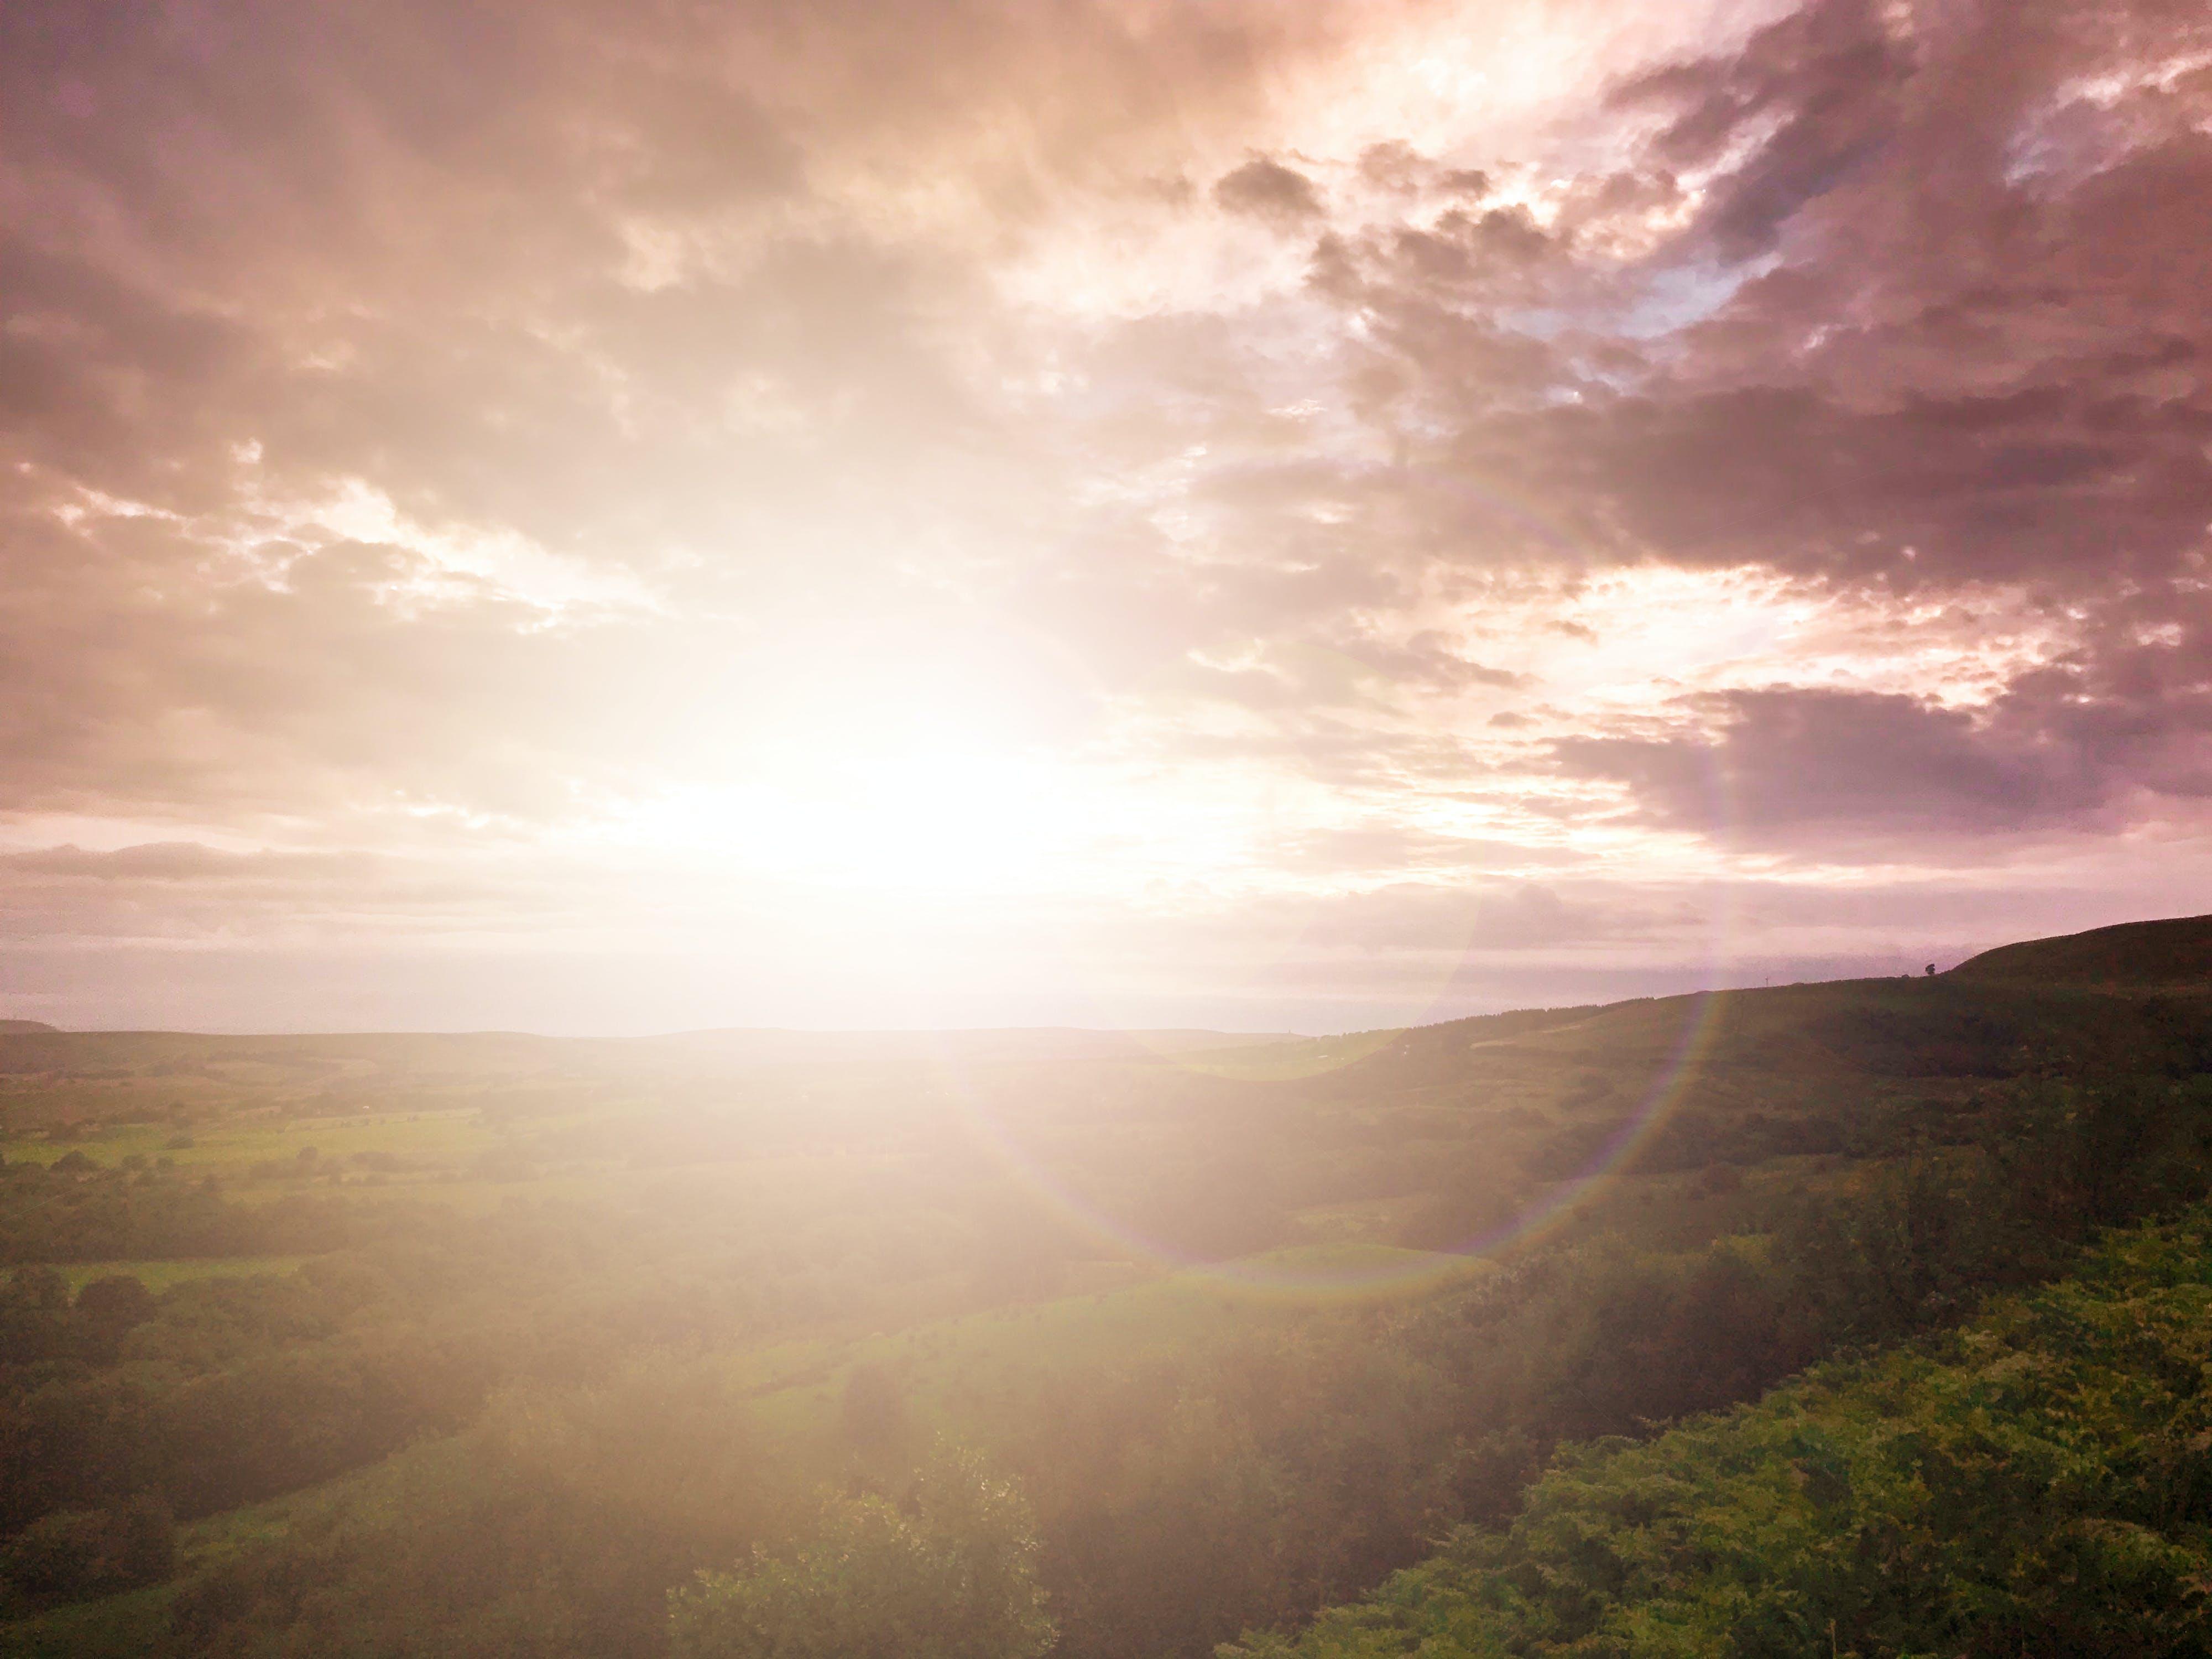 Free stock photo of bush, camera lens, cloud, evening sun